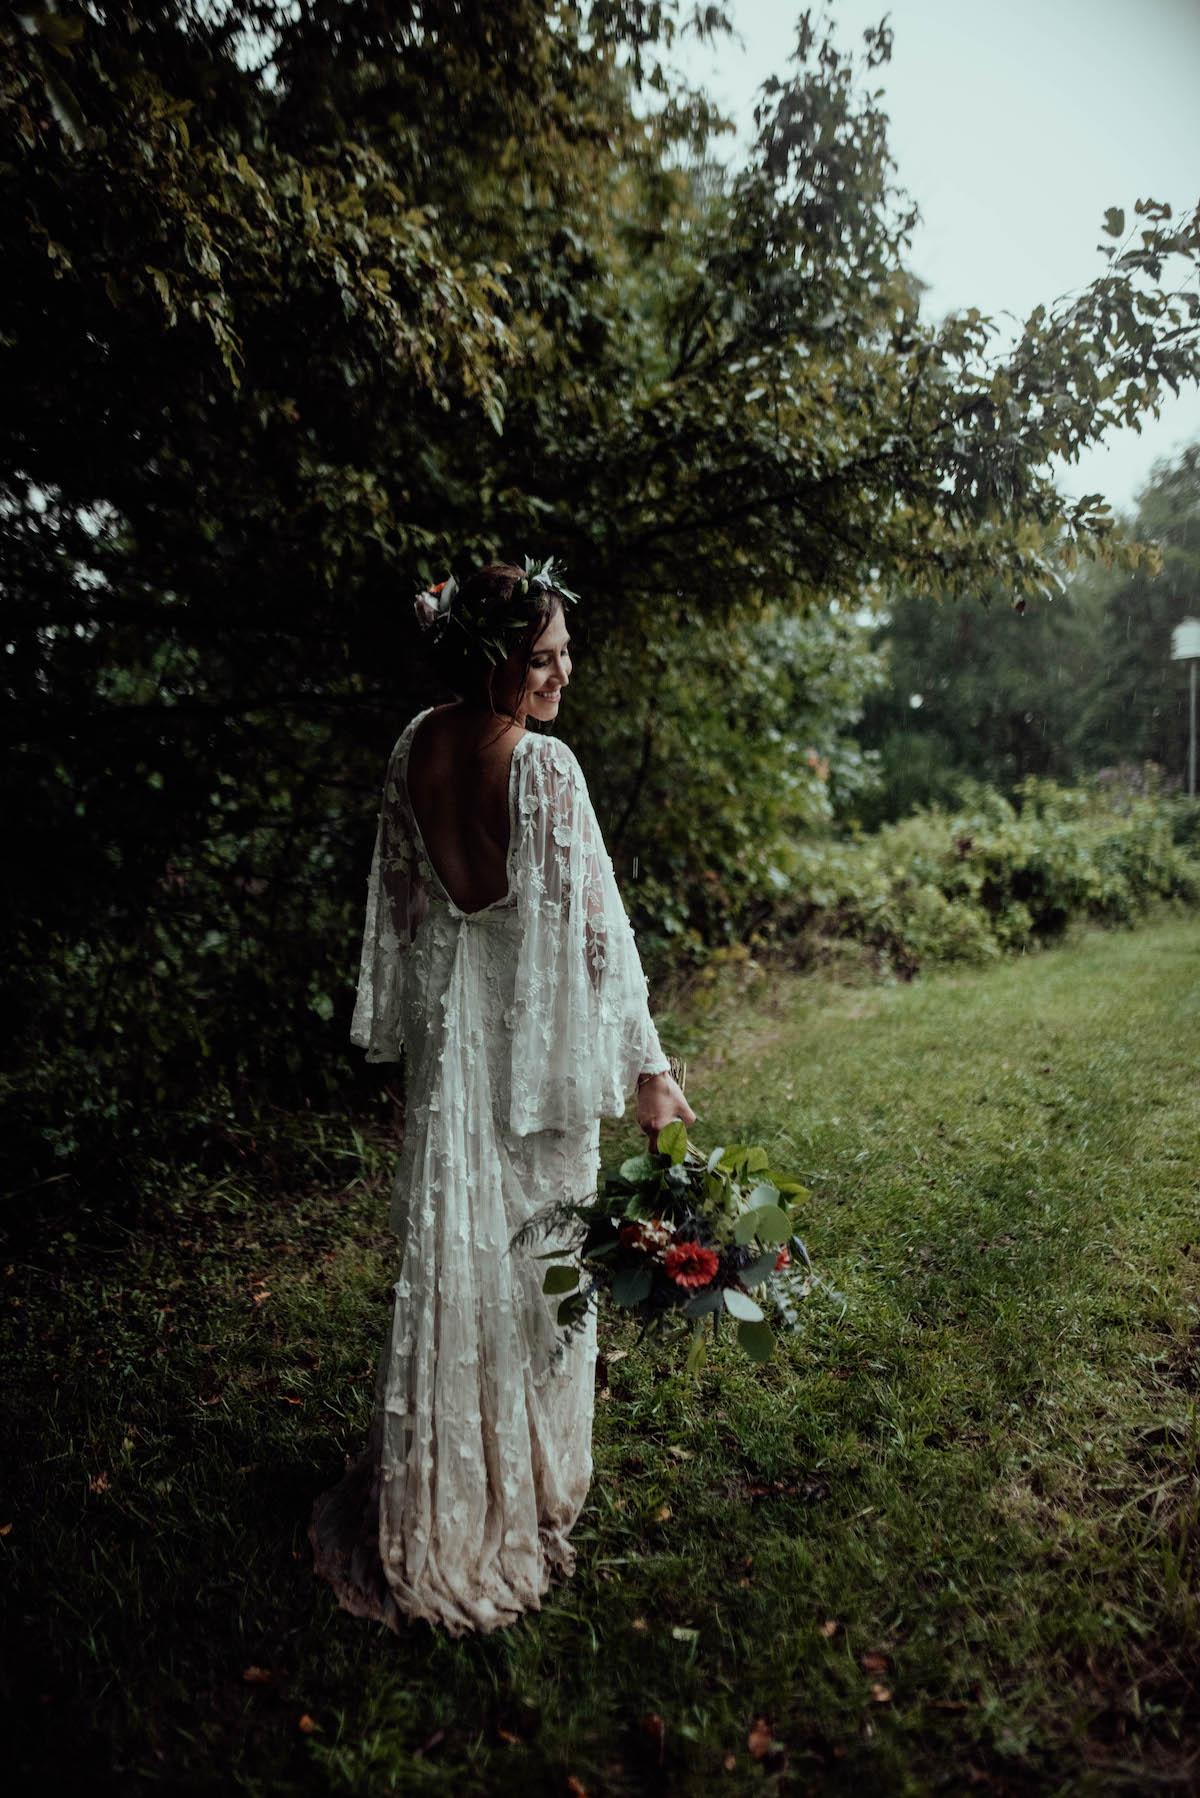 Bride Alison at her Intimate Backyard Wedding